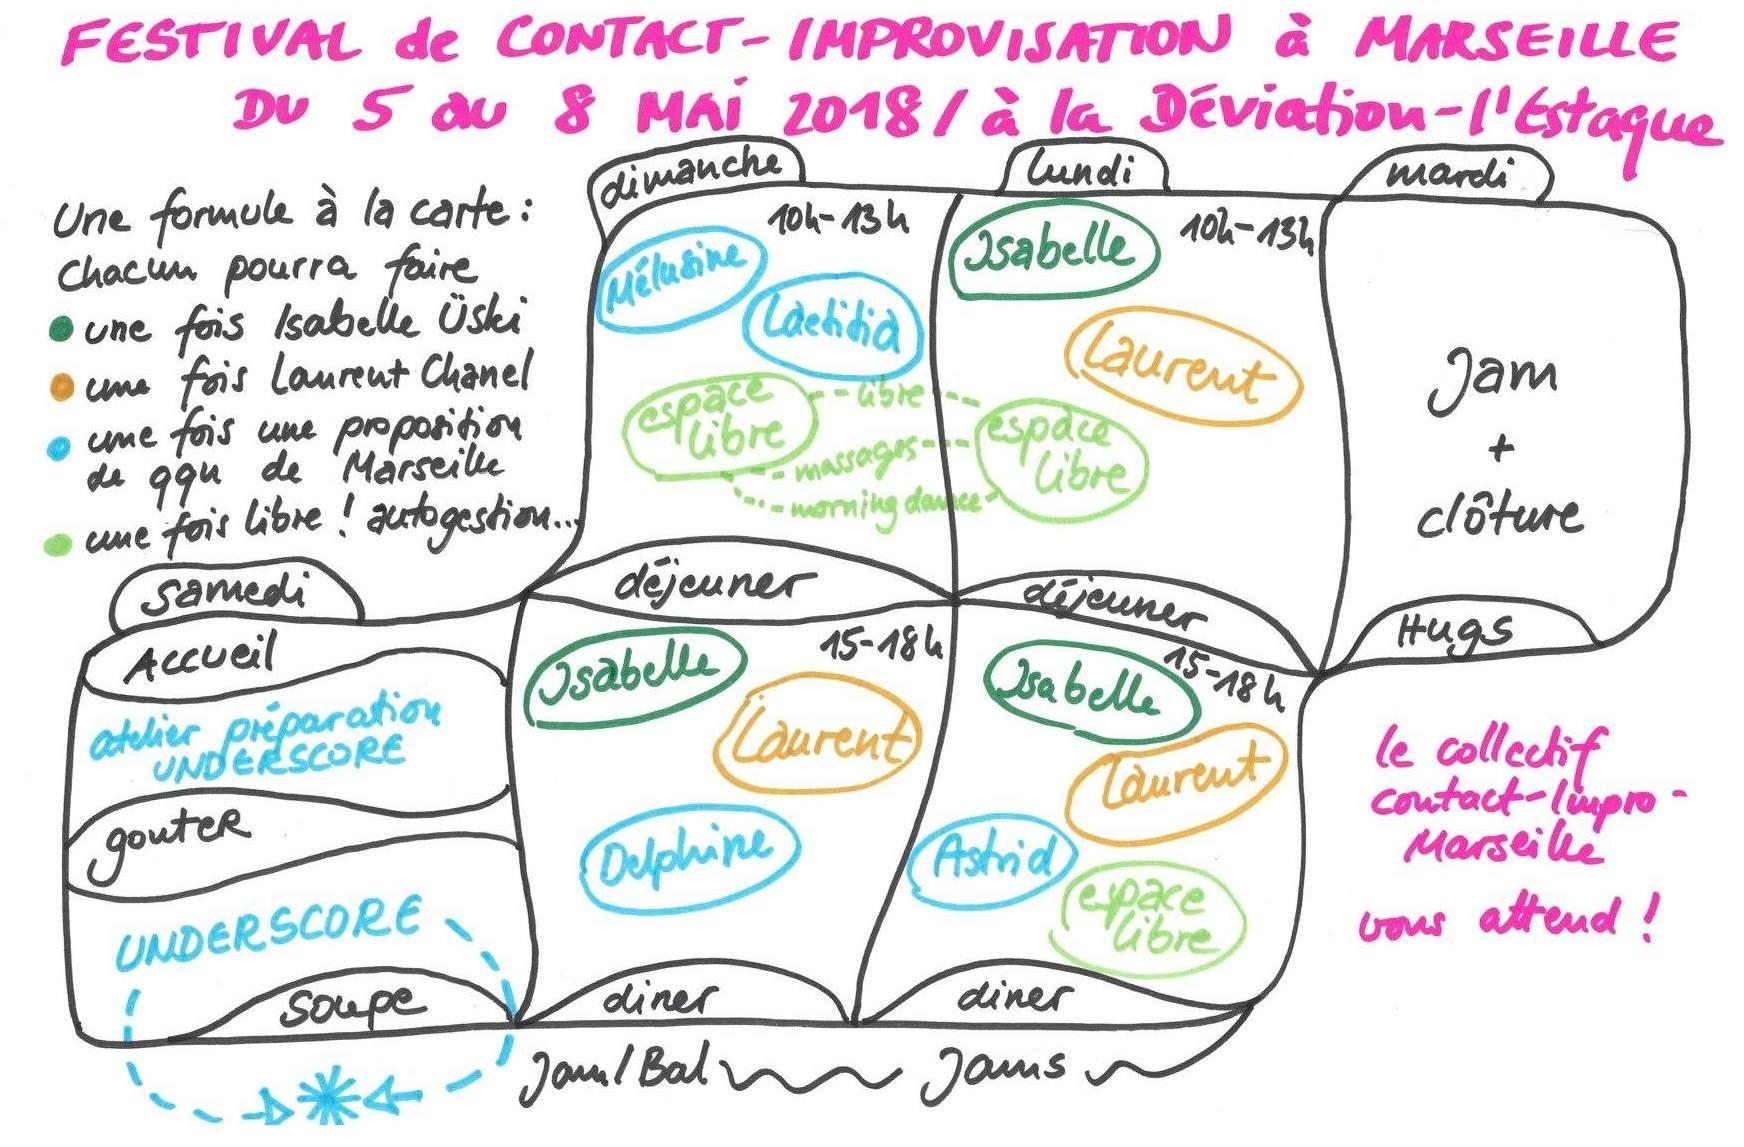 Festival de Contact Improvisation de Marseille